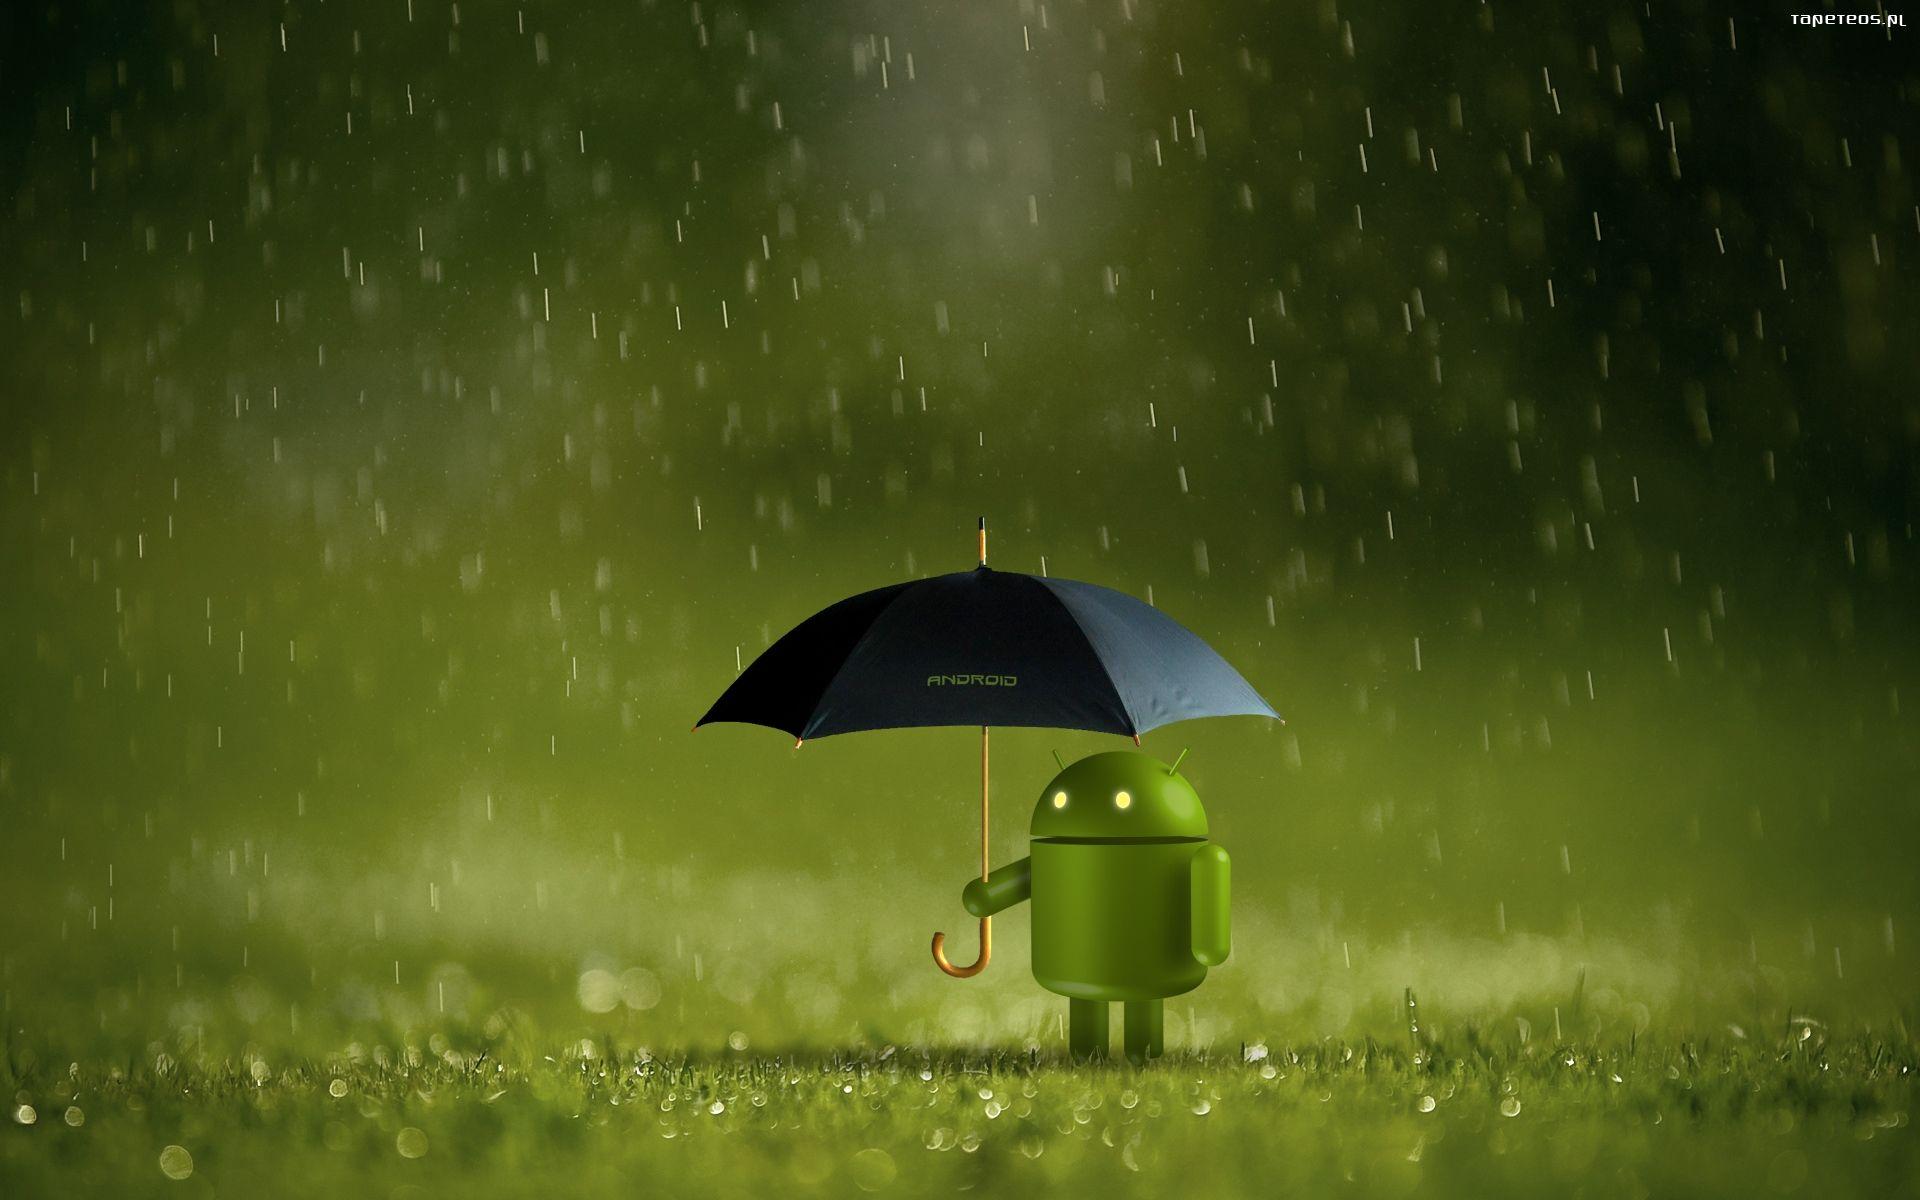 http://www.tapeteos.pl/data/media/760/big/android_1920x1200_005.jpg